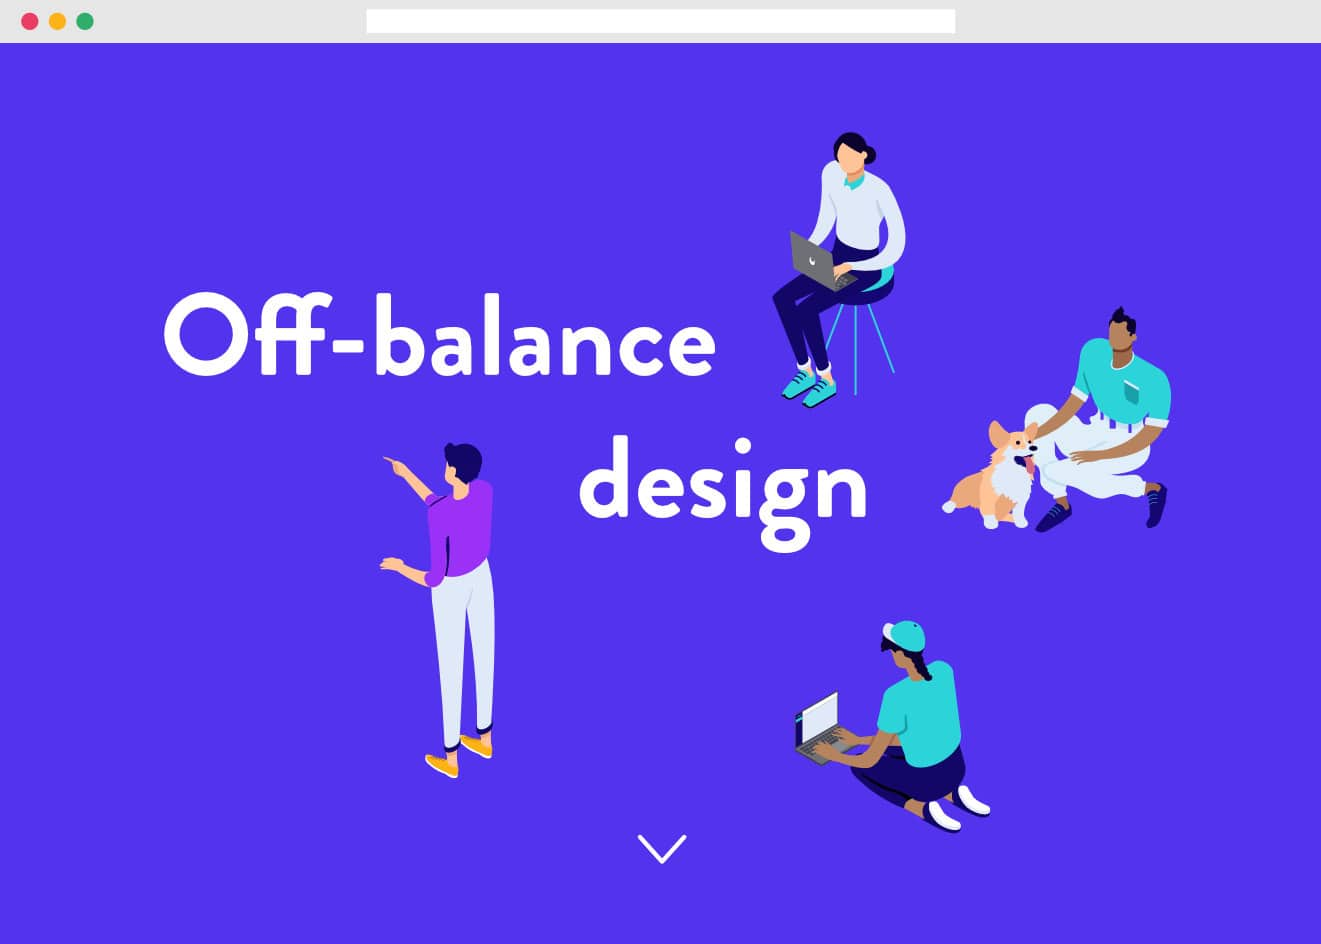 Off-balance design